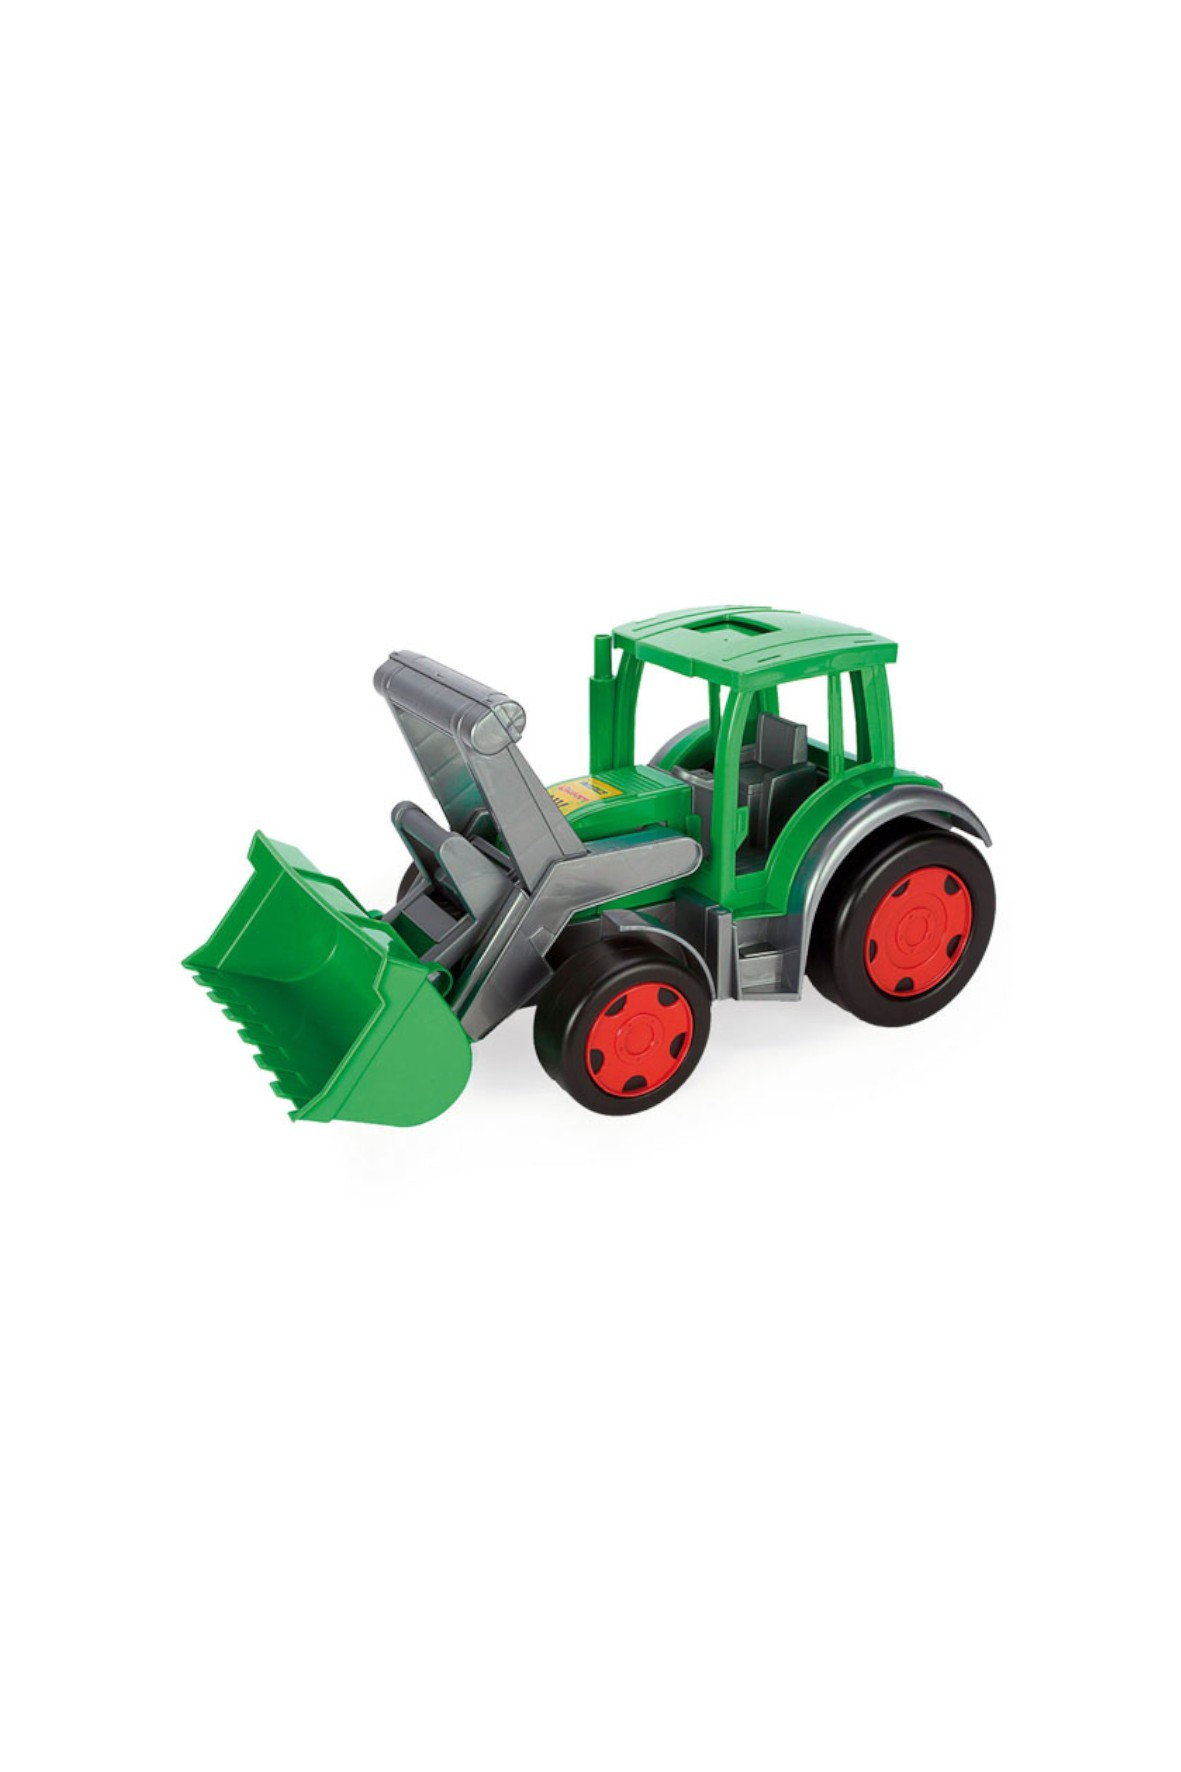 Gigant traktor spychacz Farmer